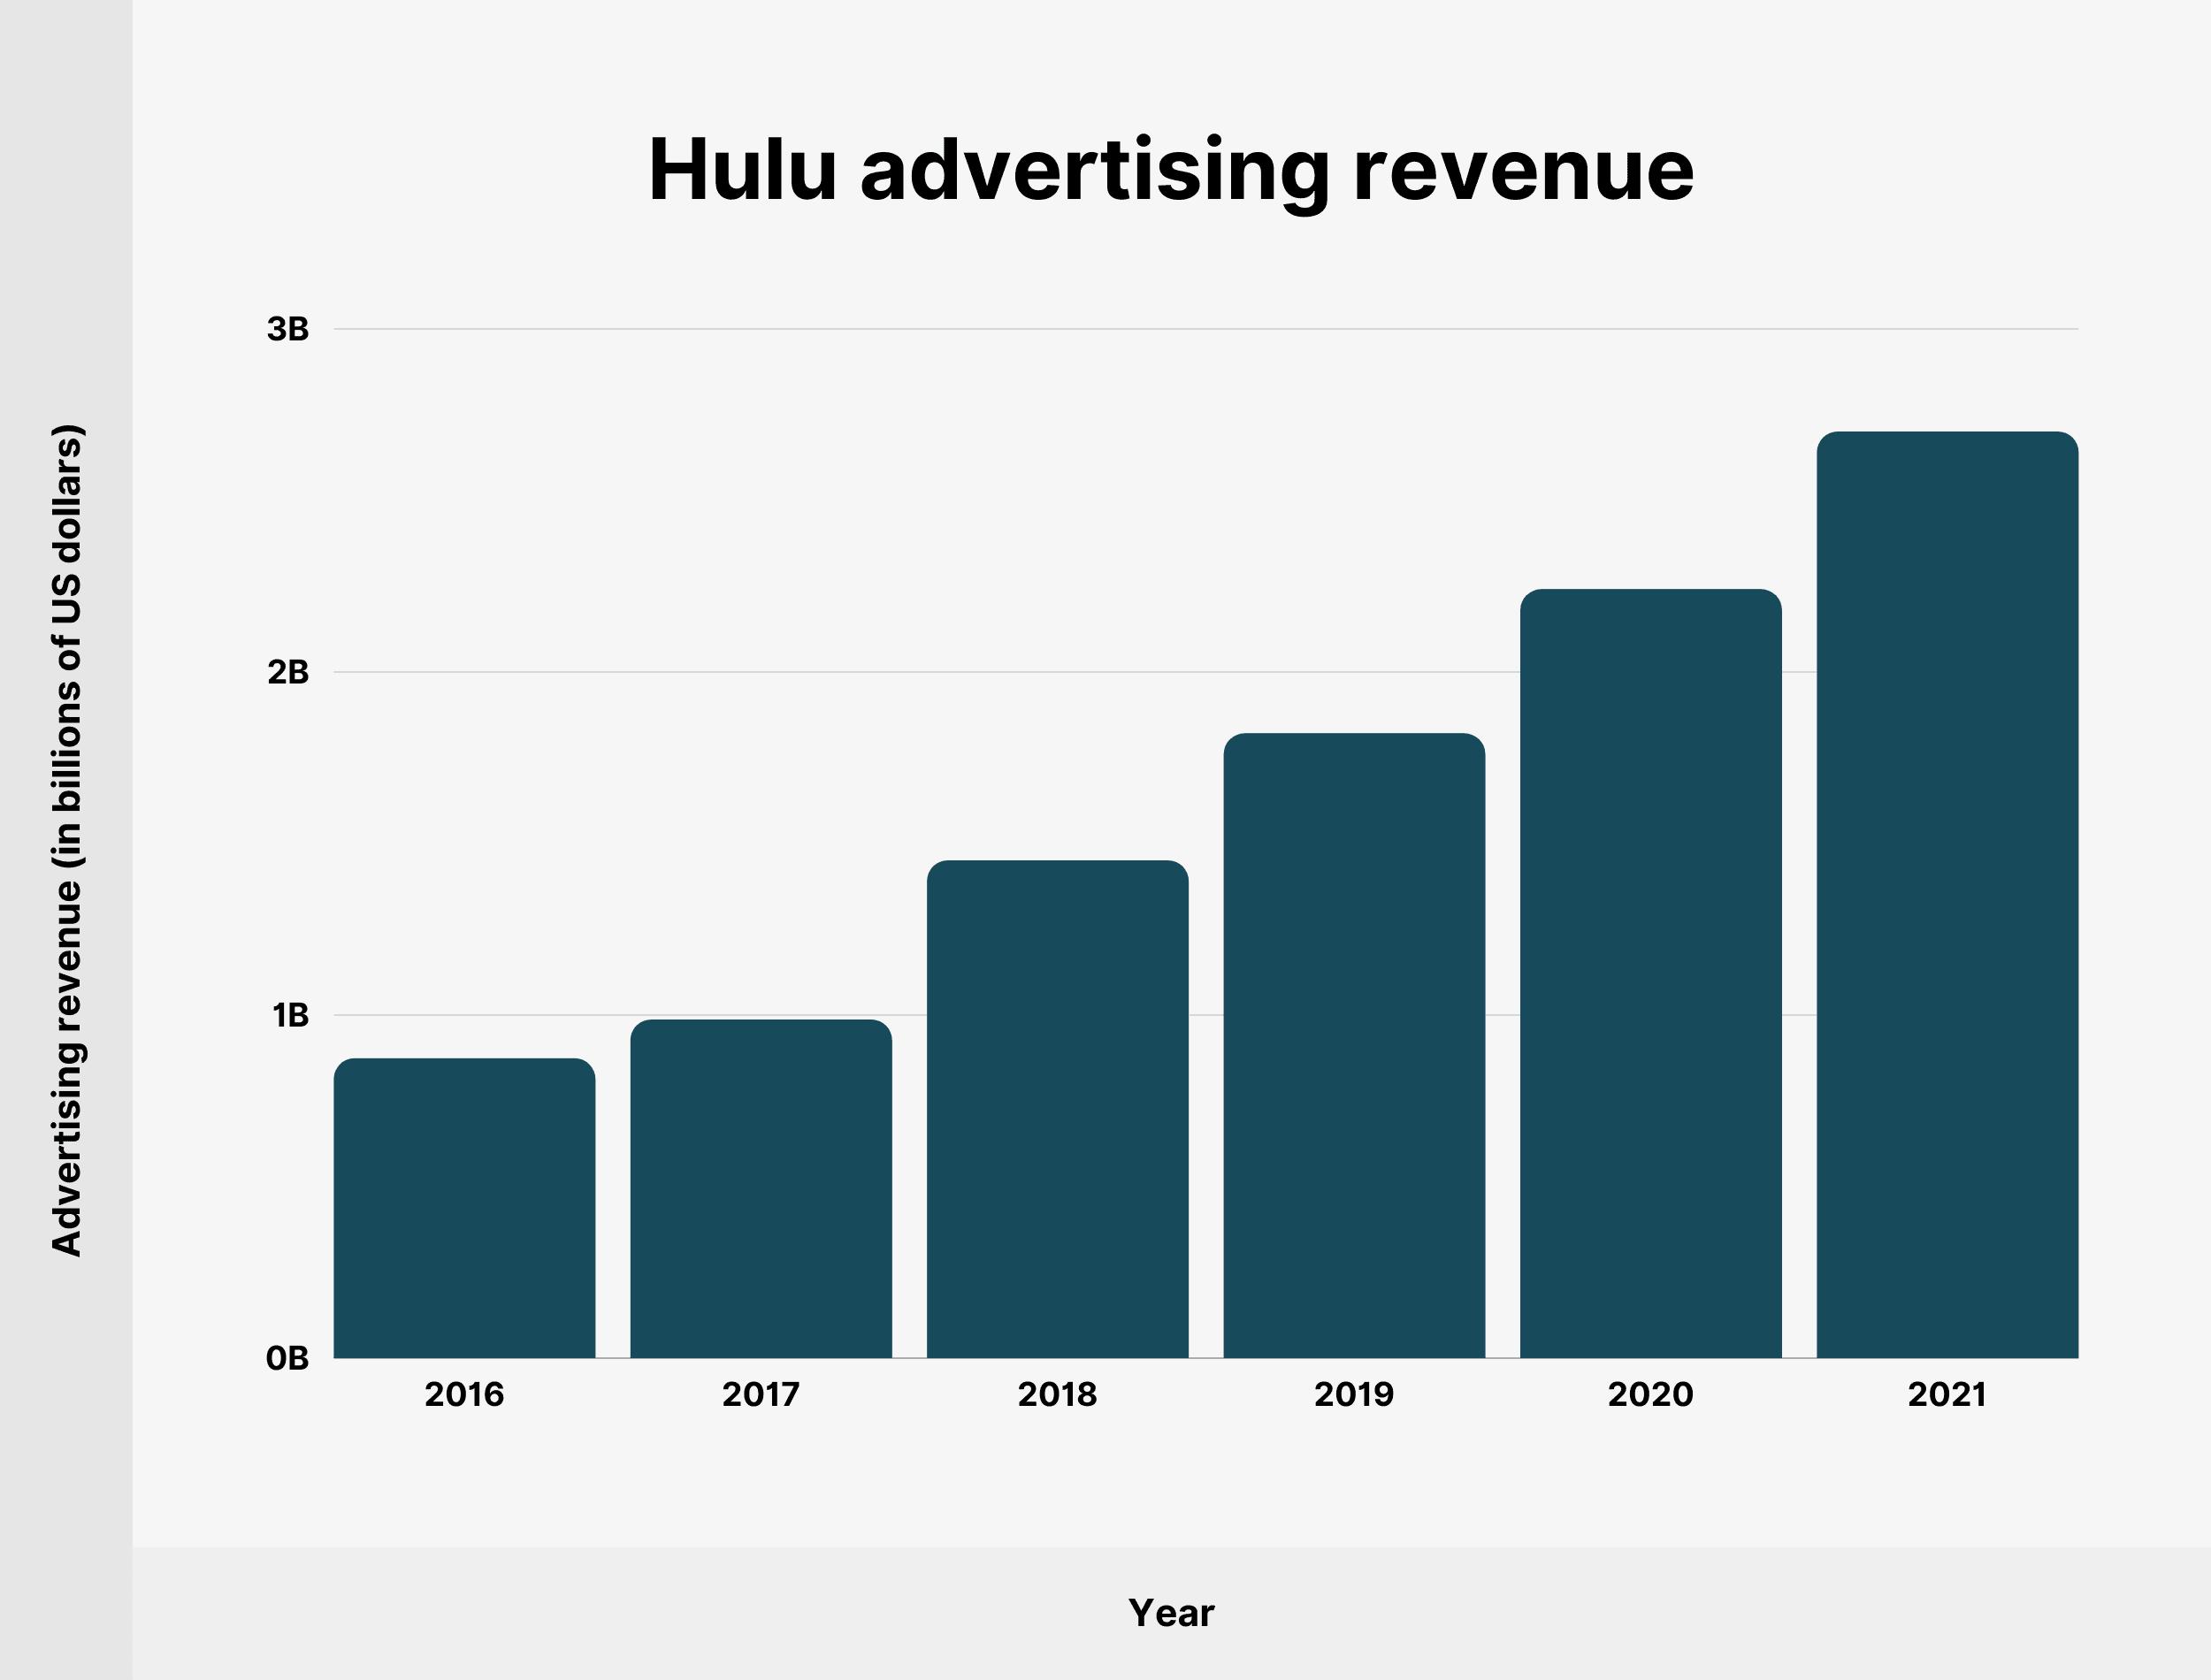 Hulu advertising revenue